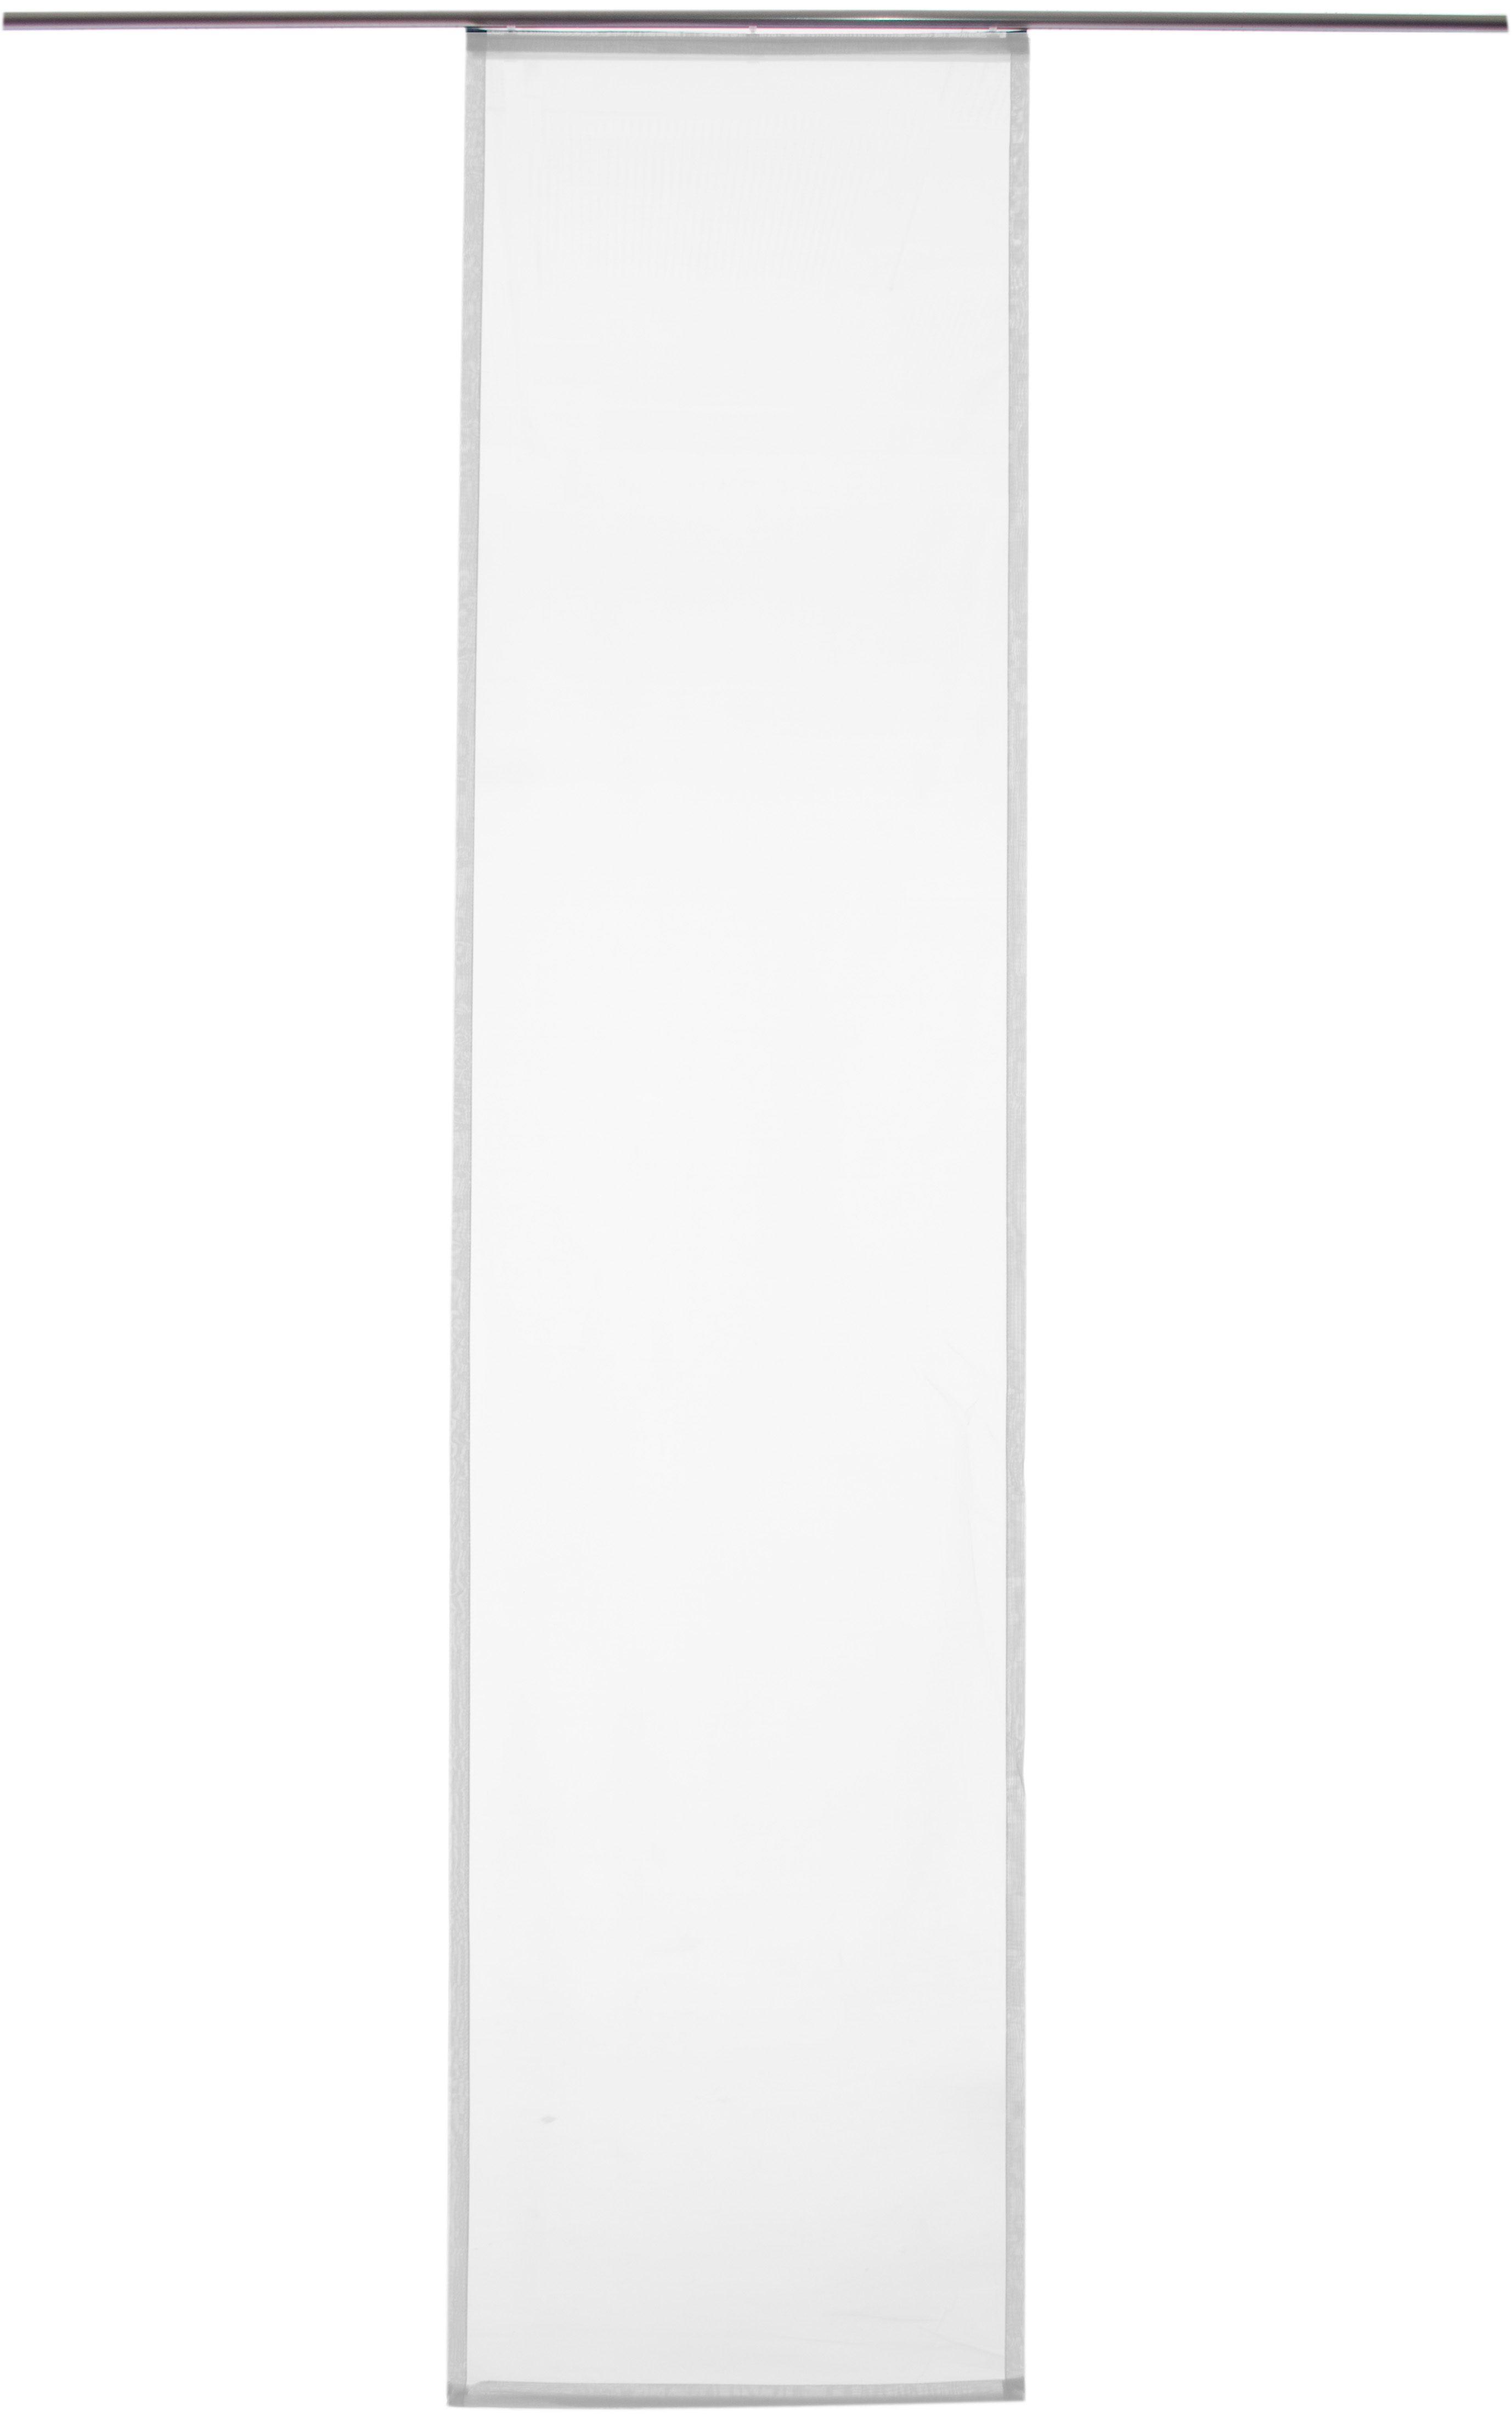 Schiebegardine »Batist Uni«, HOMING, Klettband (1 Stück), inkl. Beschwerungsstange